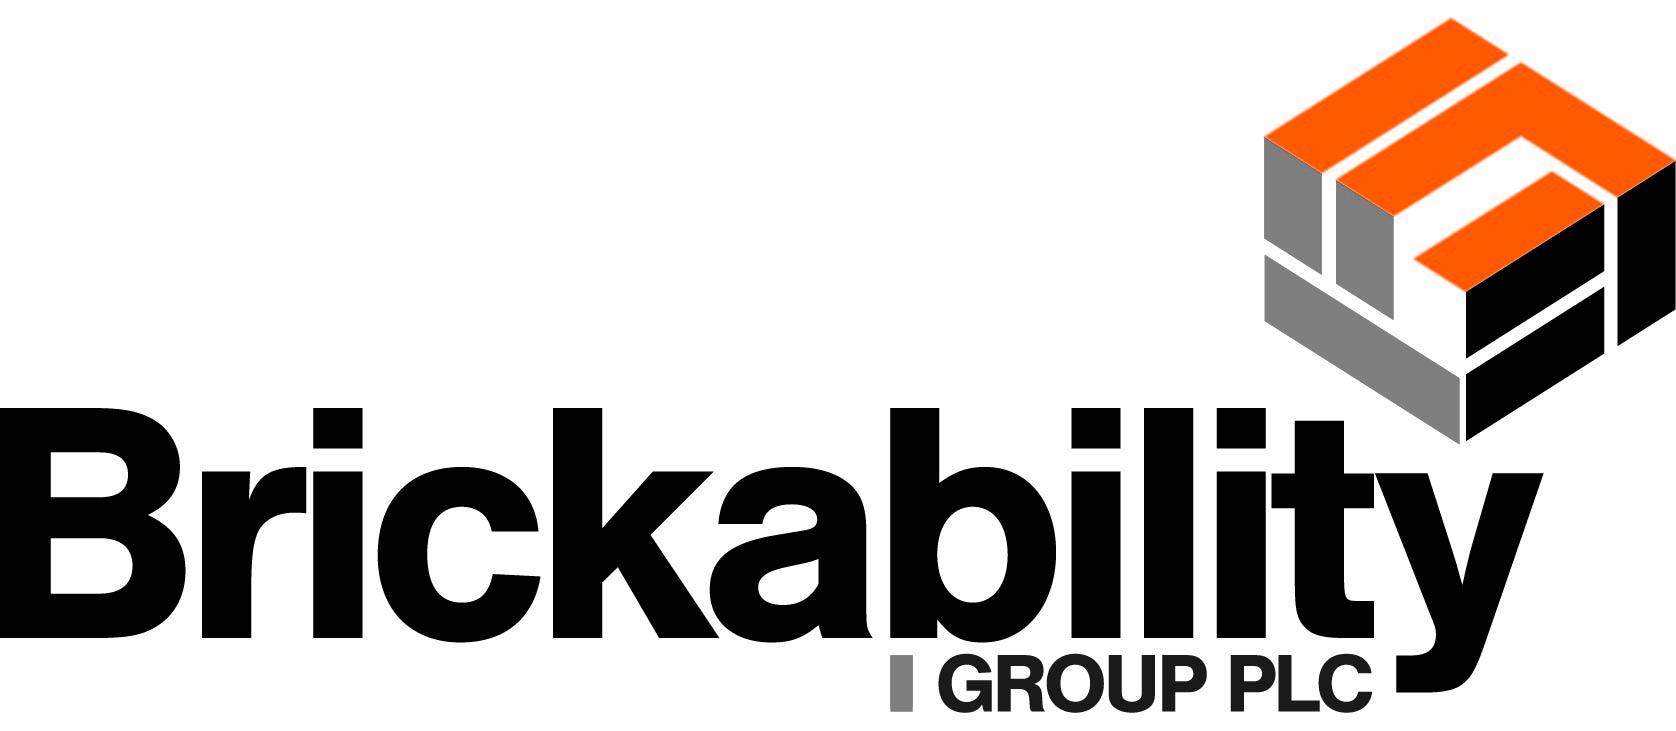 Brickability_logo.jpg